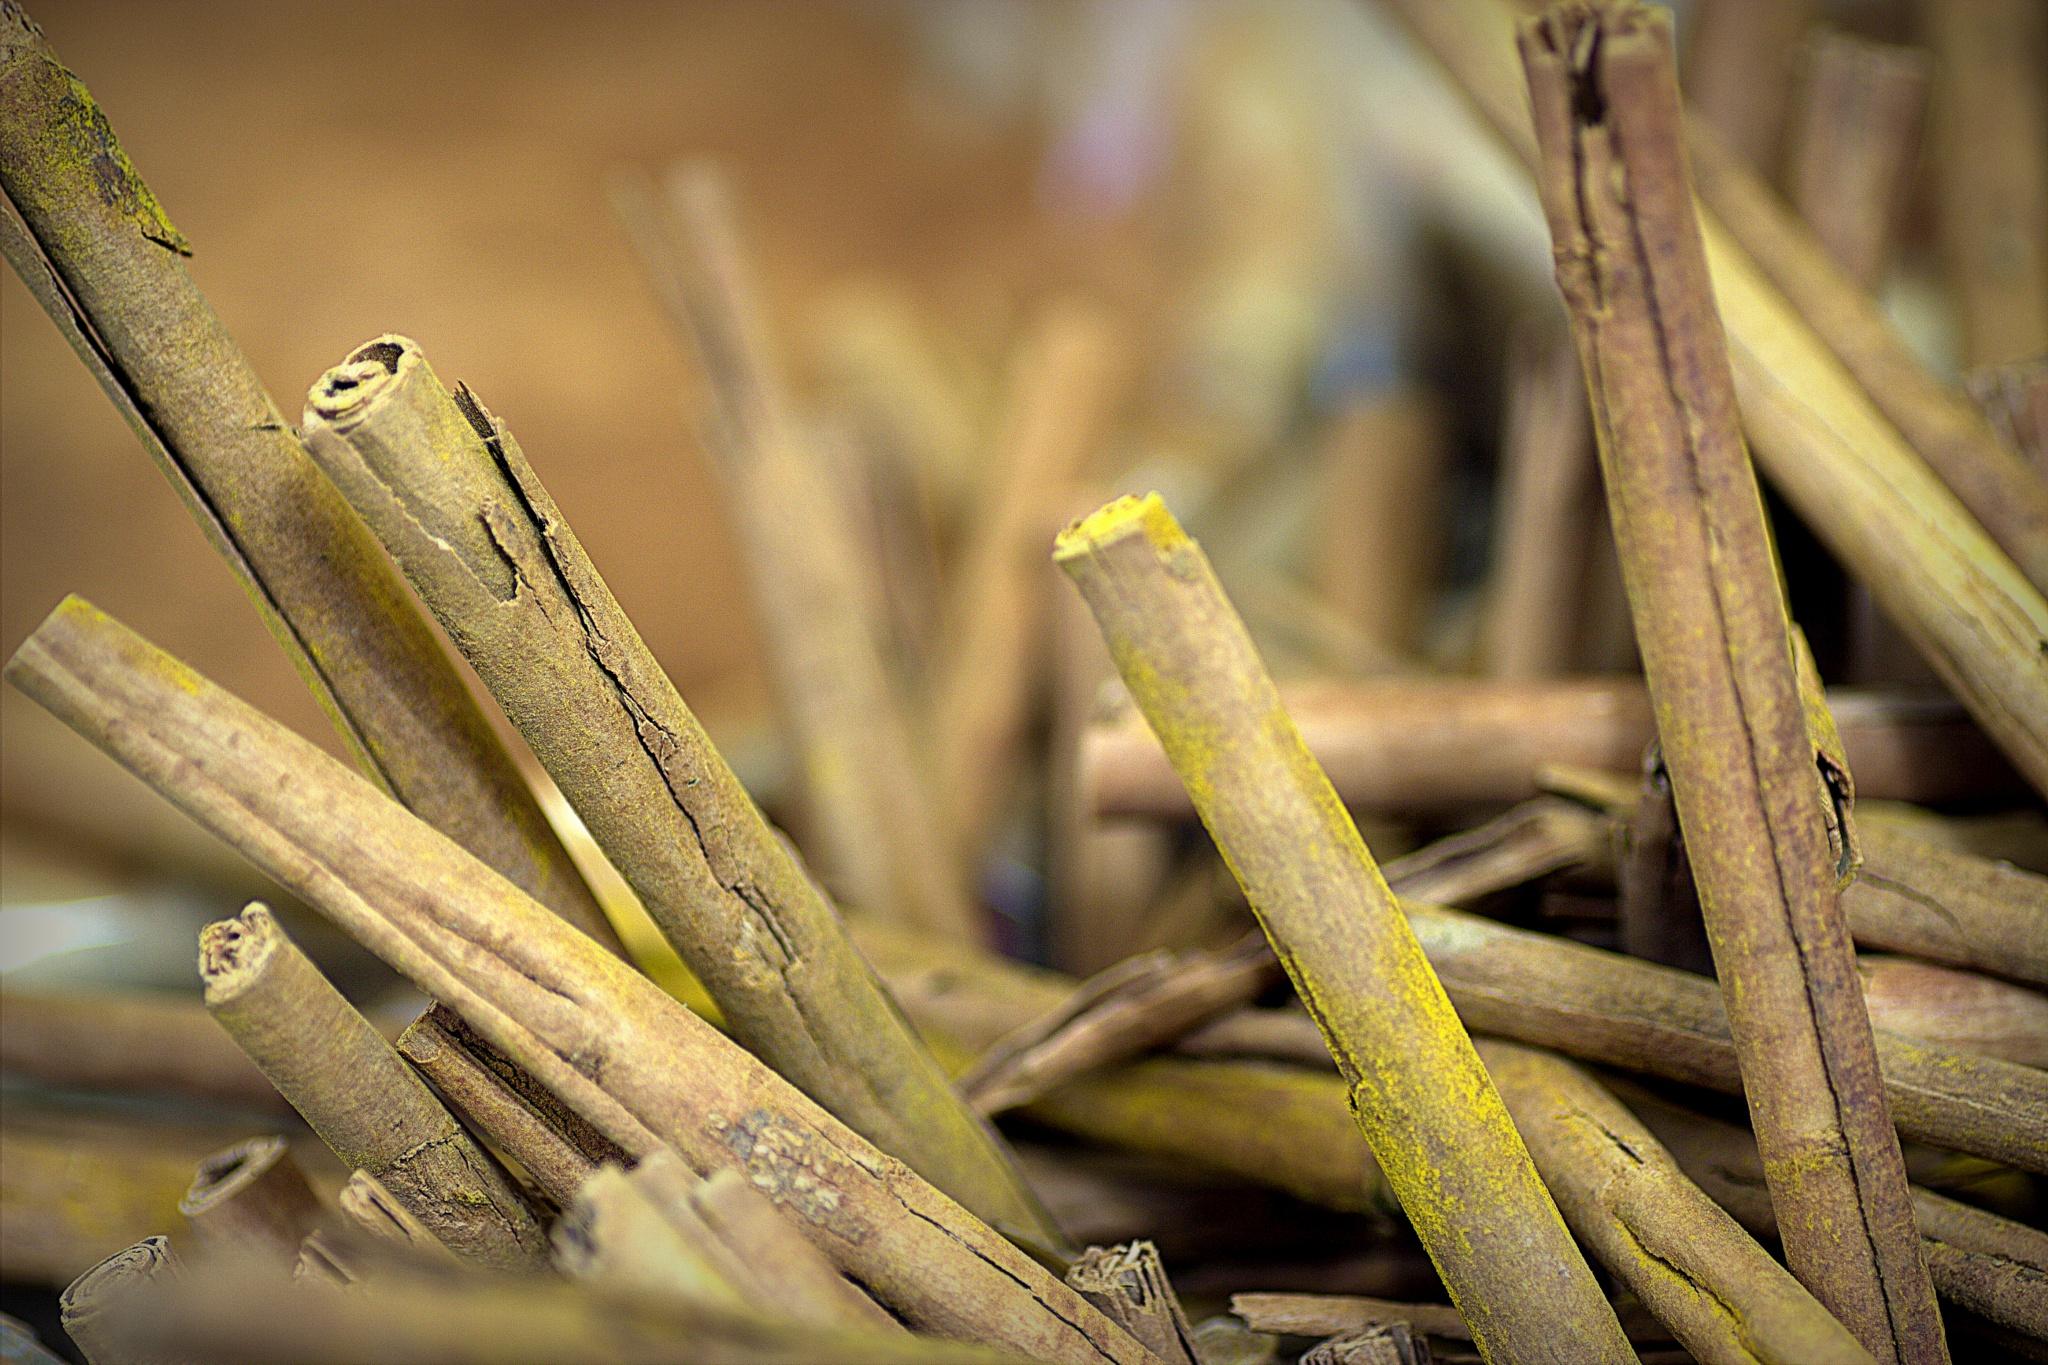 Market Ljubljana - cinnamon sticks .. by leopold.brzin